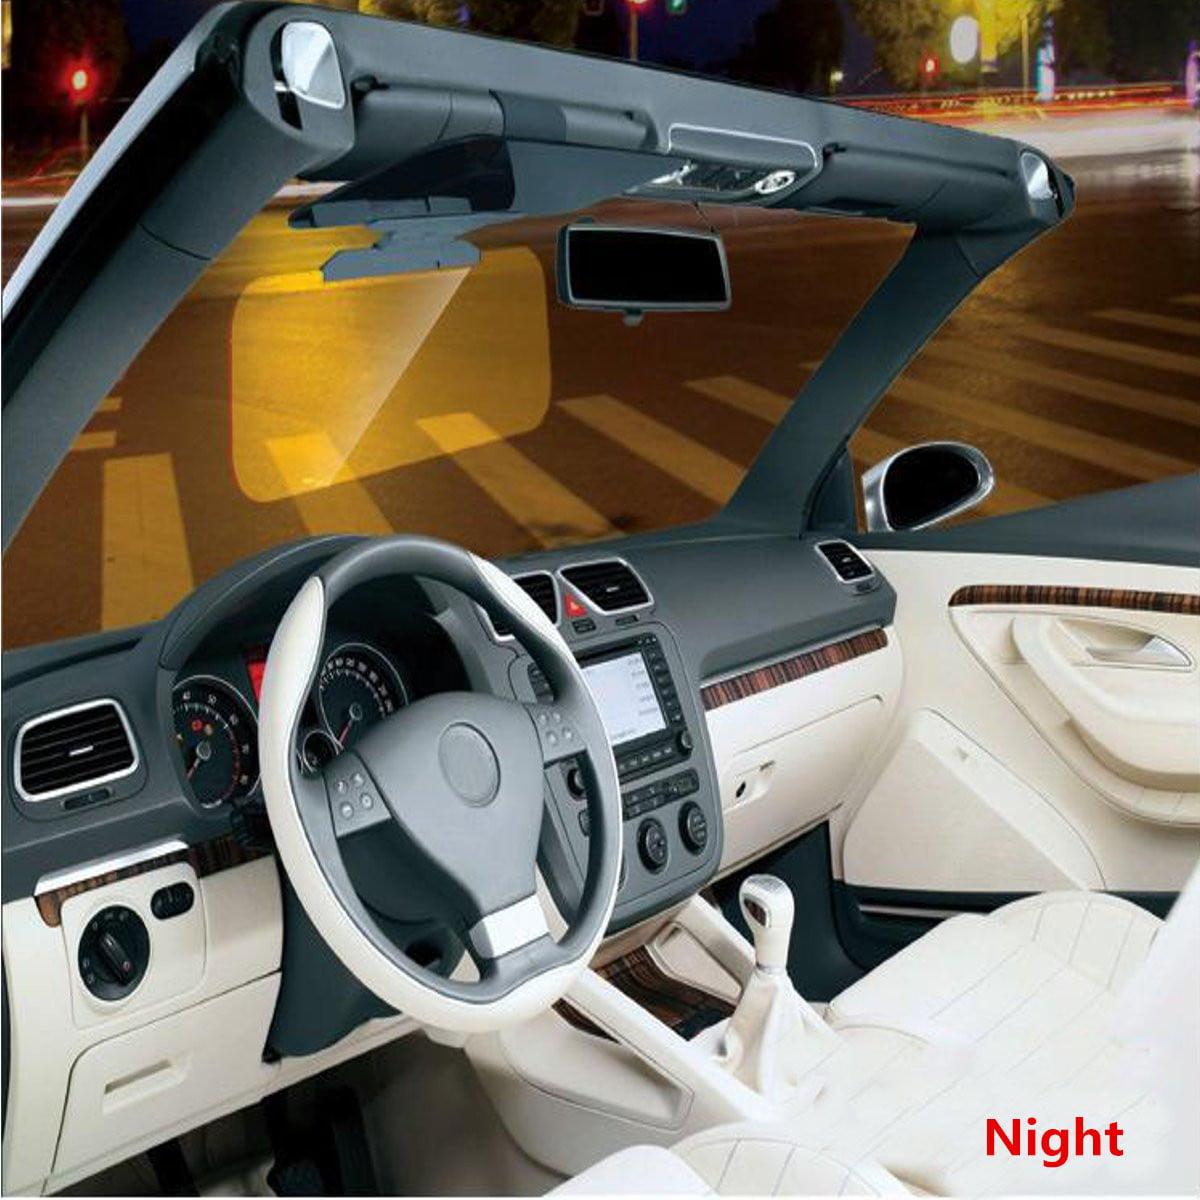 HD Anti-Glare Auto Car Flip Down Shield Sun Visor Day Night-Vision Block View UV